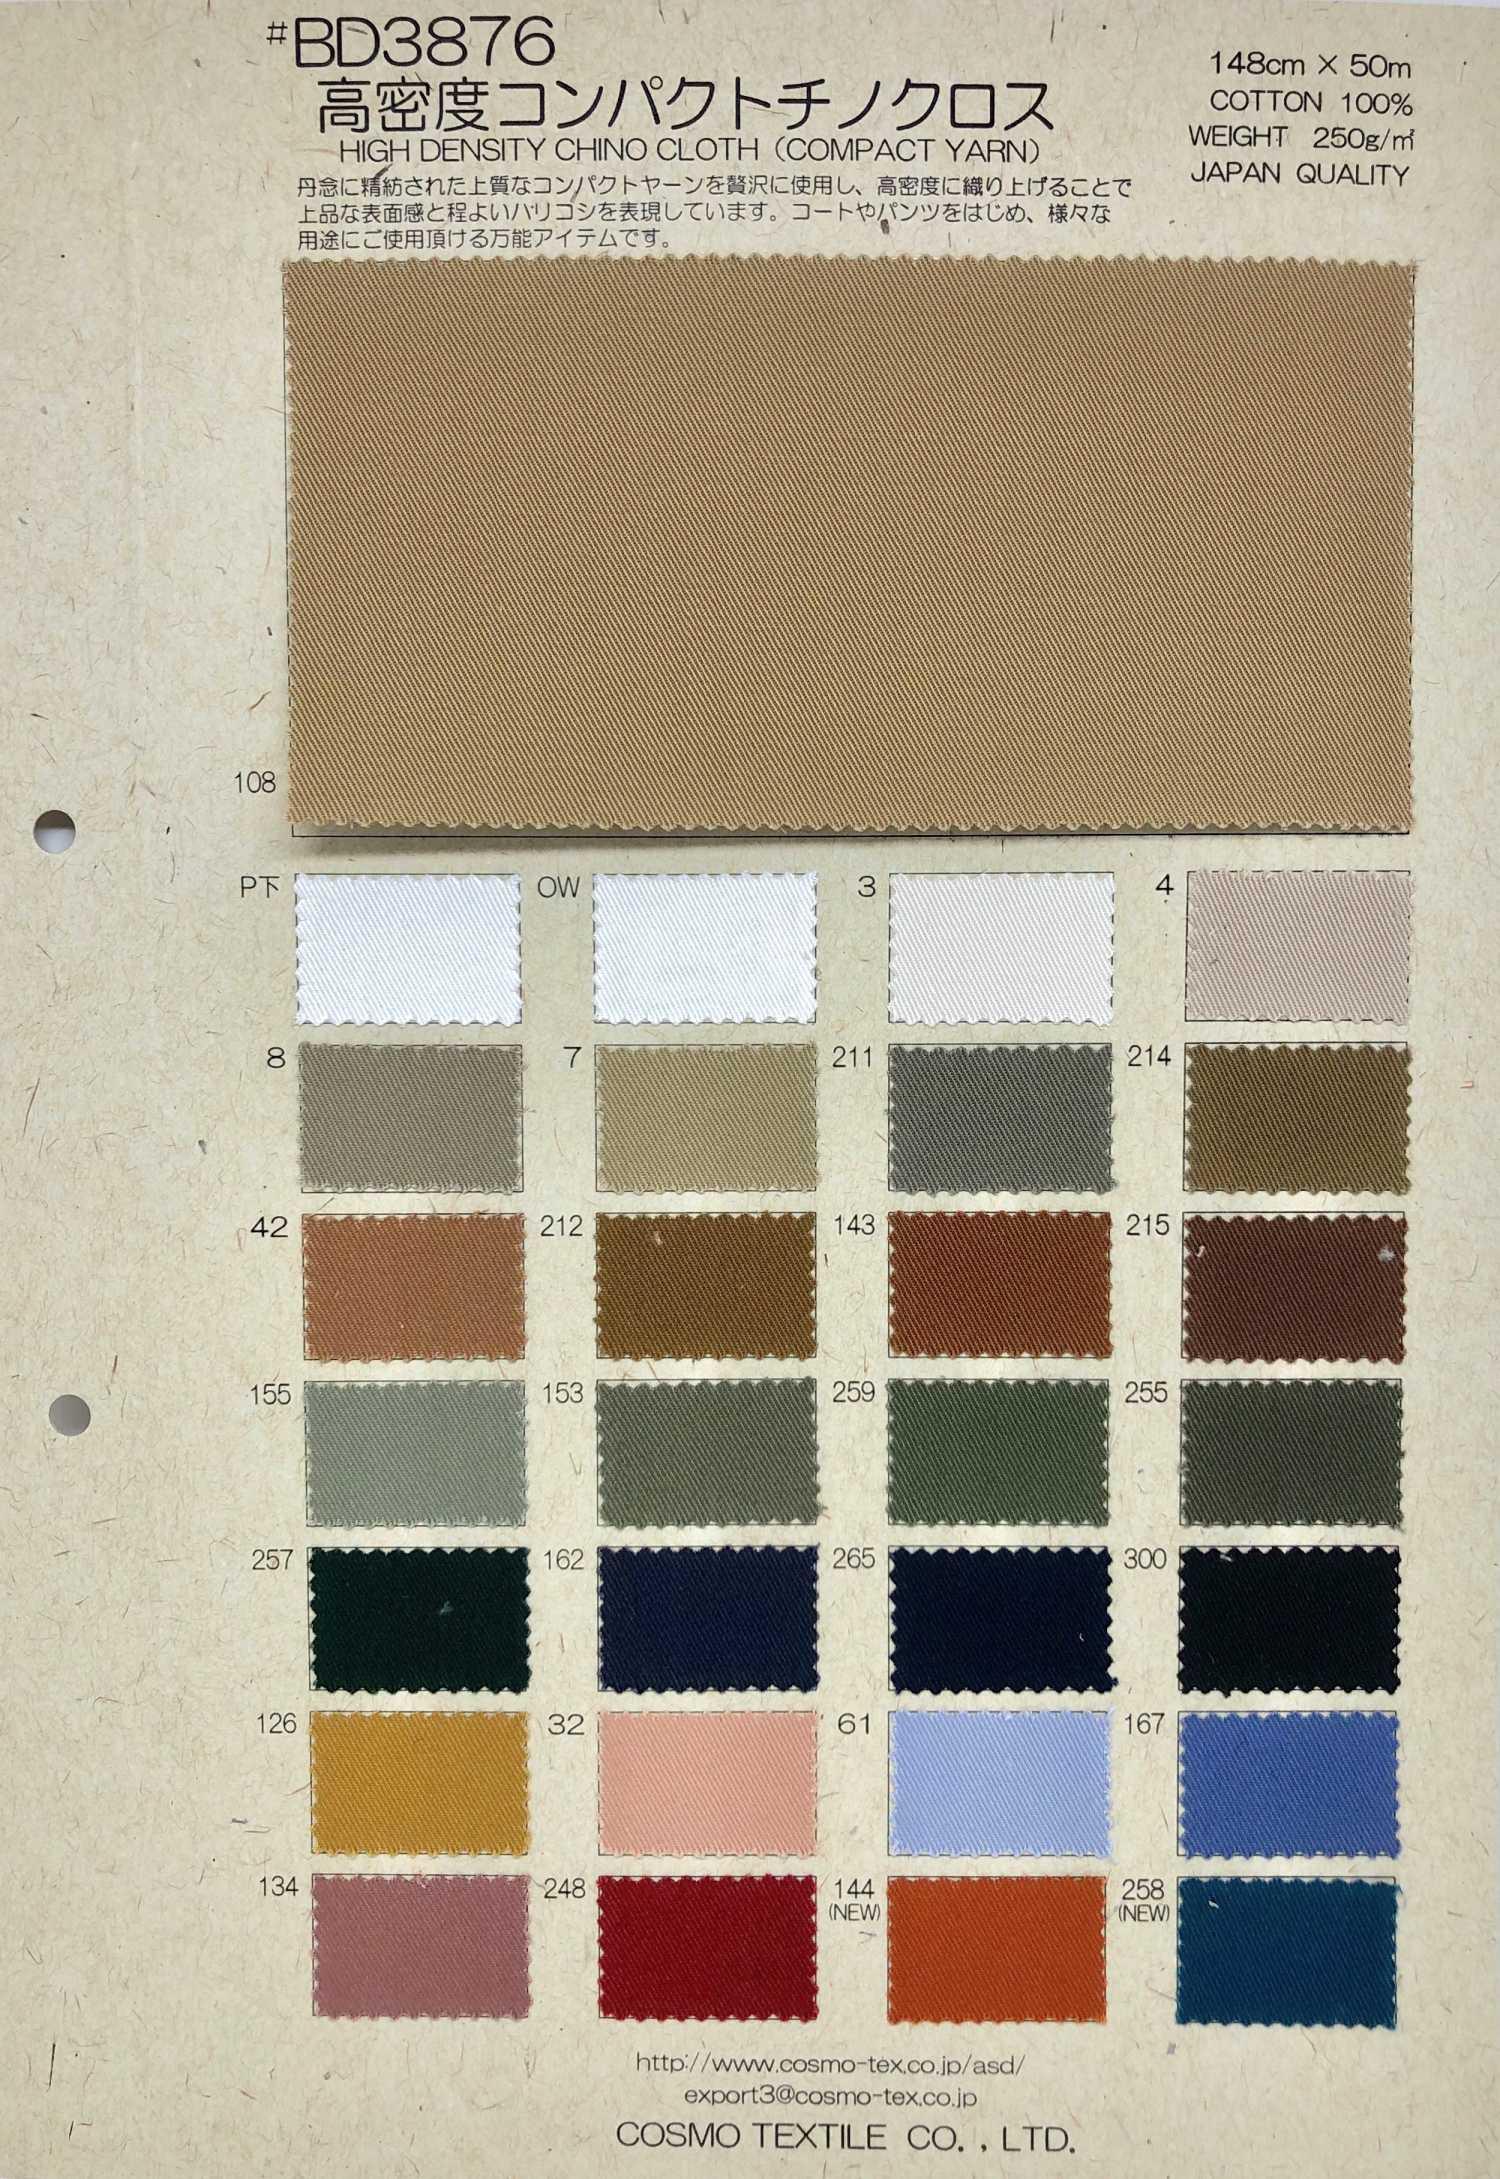 BD3876 高密度コンパクトチノクロス[生地] コスモテキスタイル/オークラ商事 - ApparelX アパレル資材卸通販